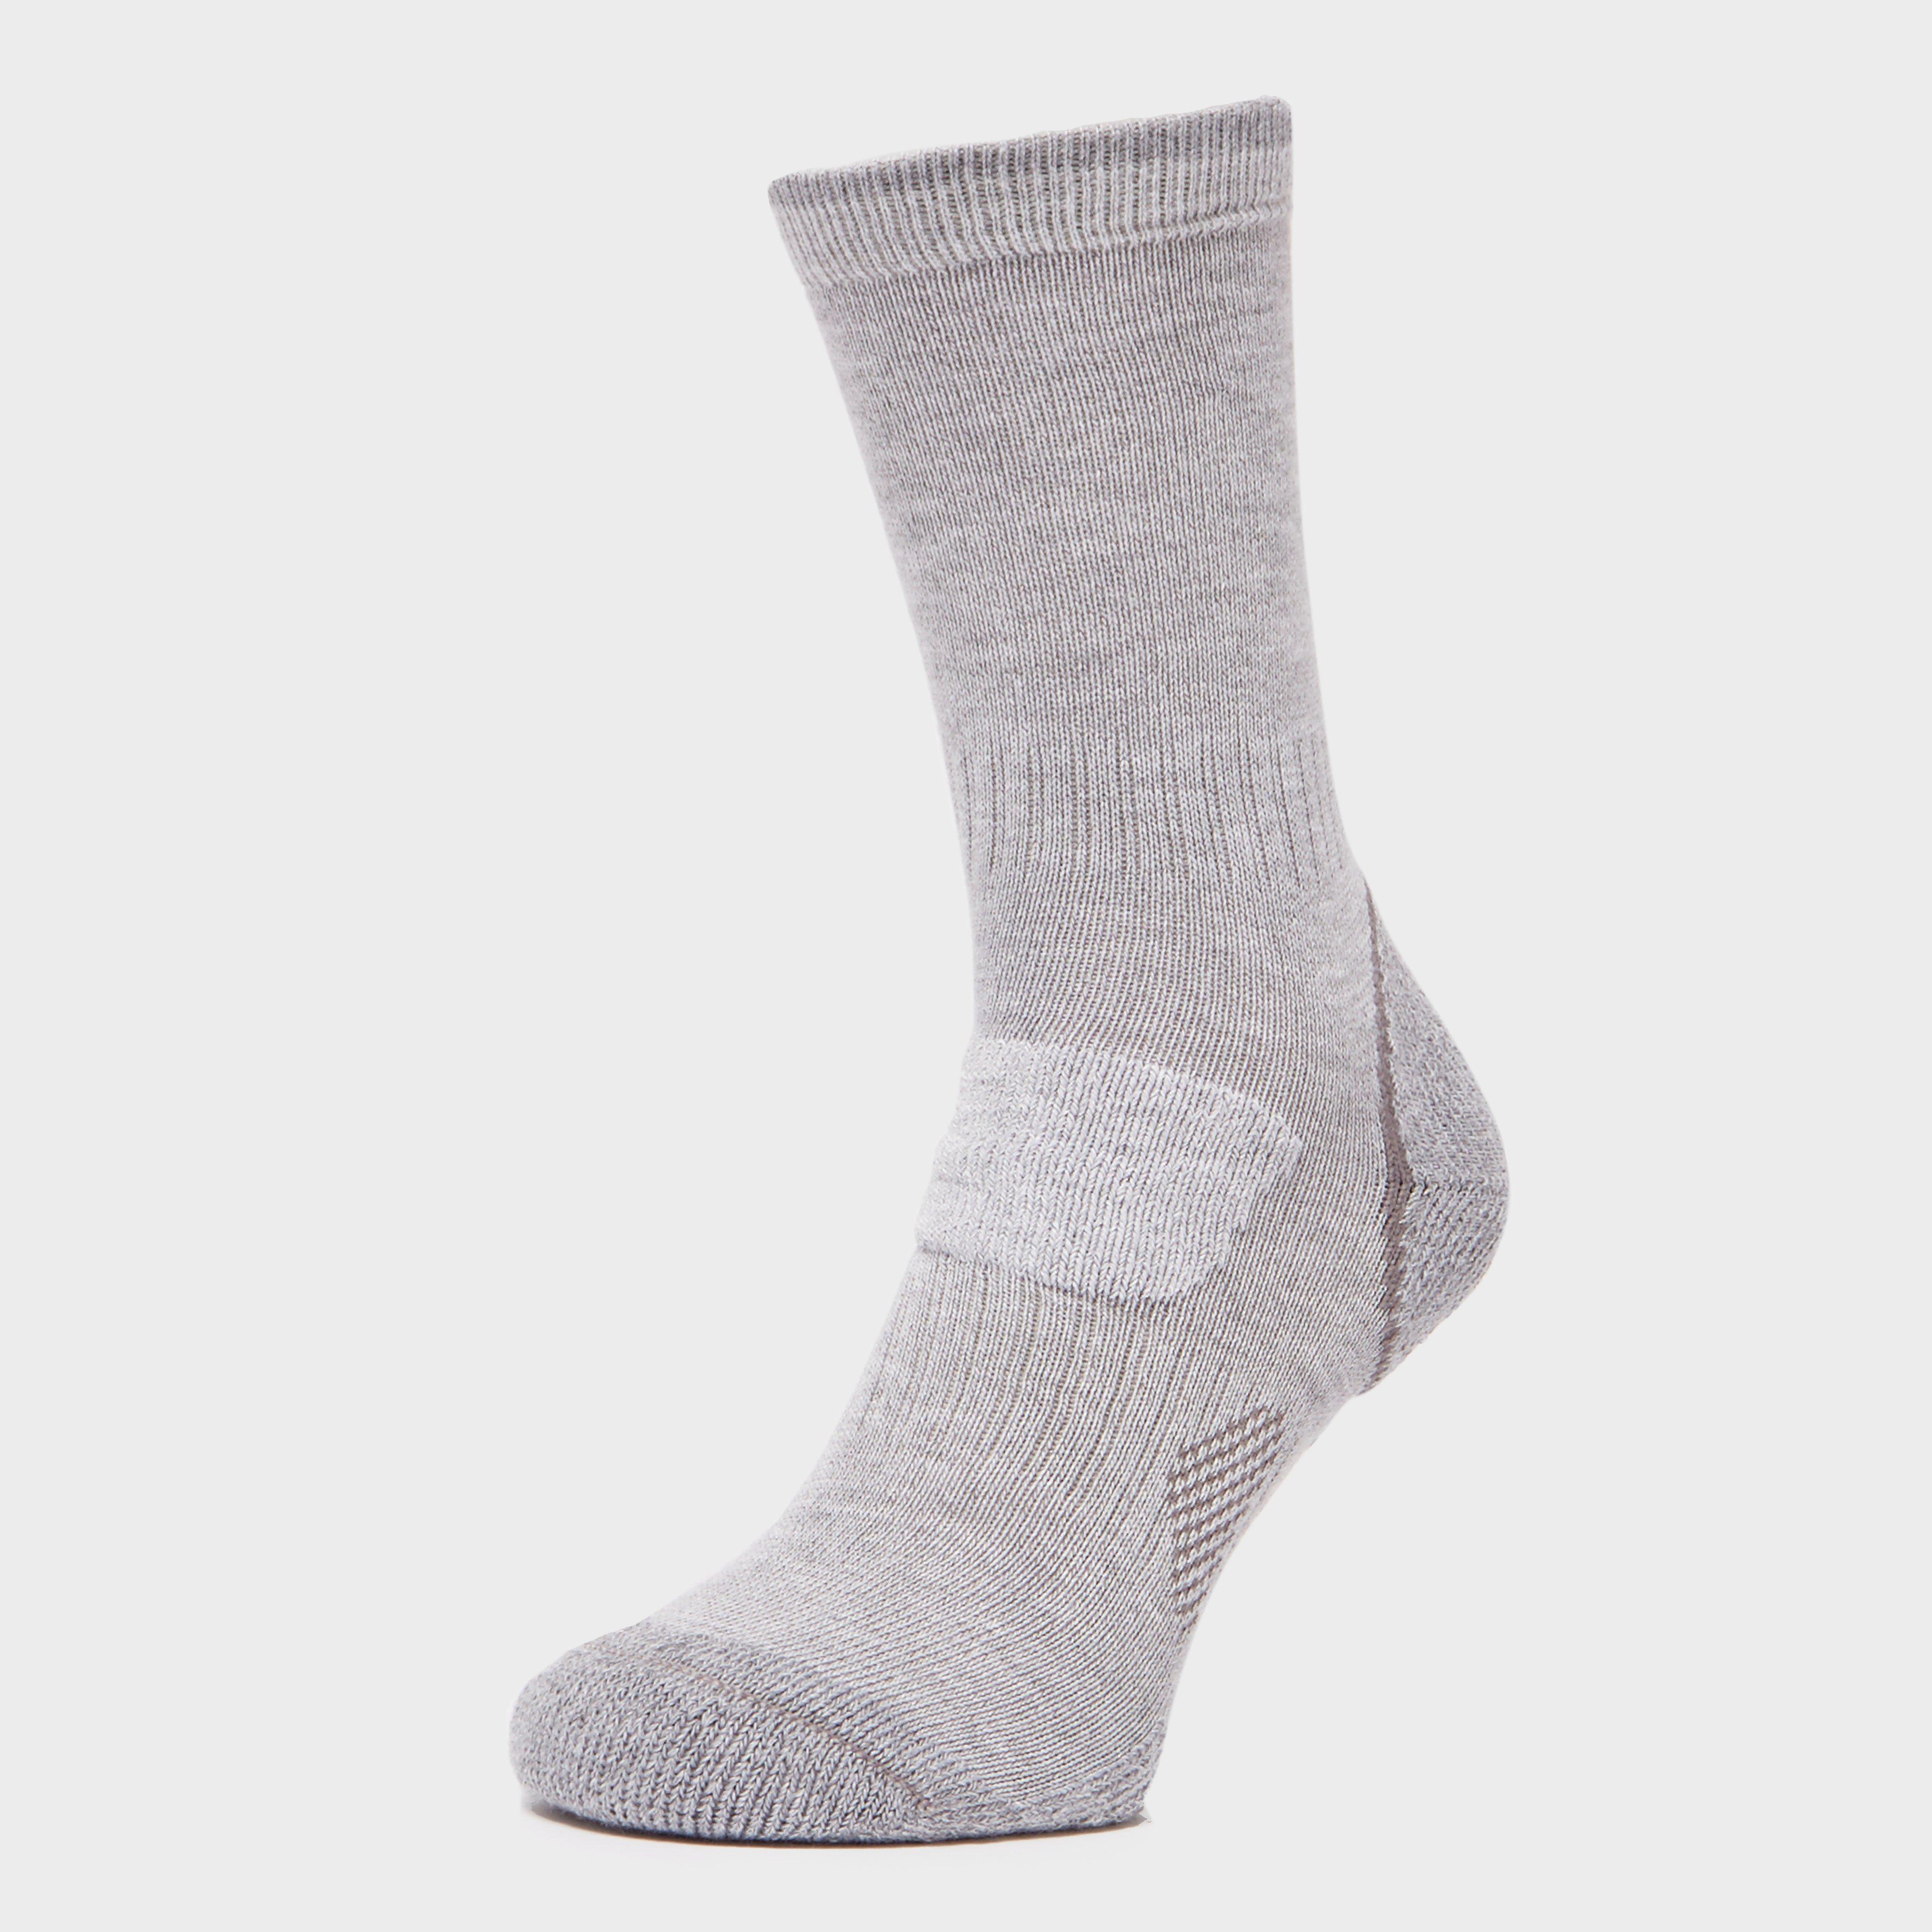 Brasher Brasher Mens Light Hiker Socks - Grey, Grey